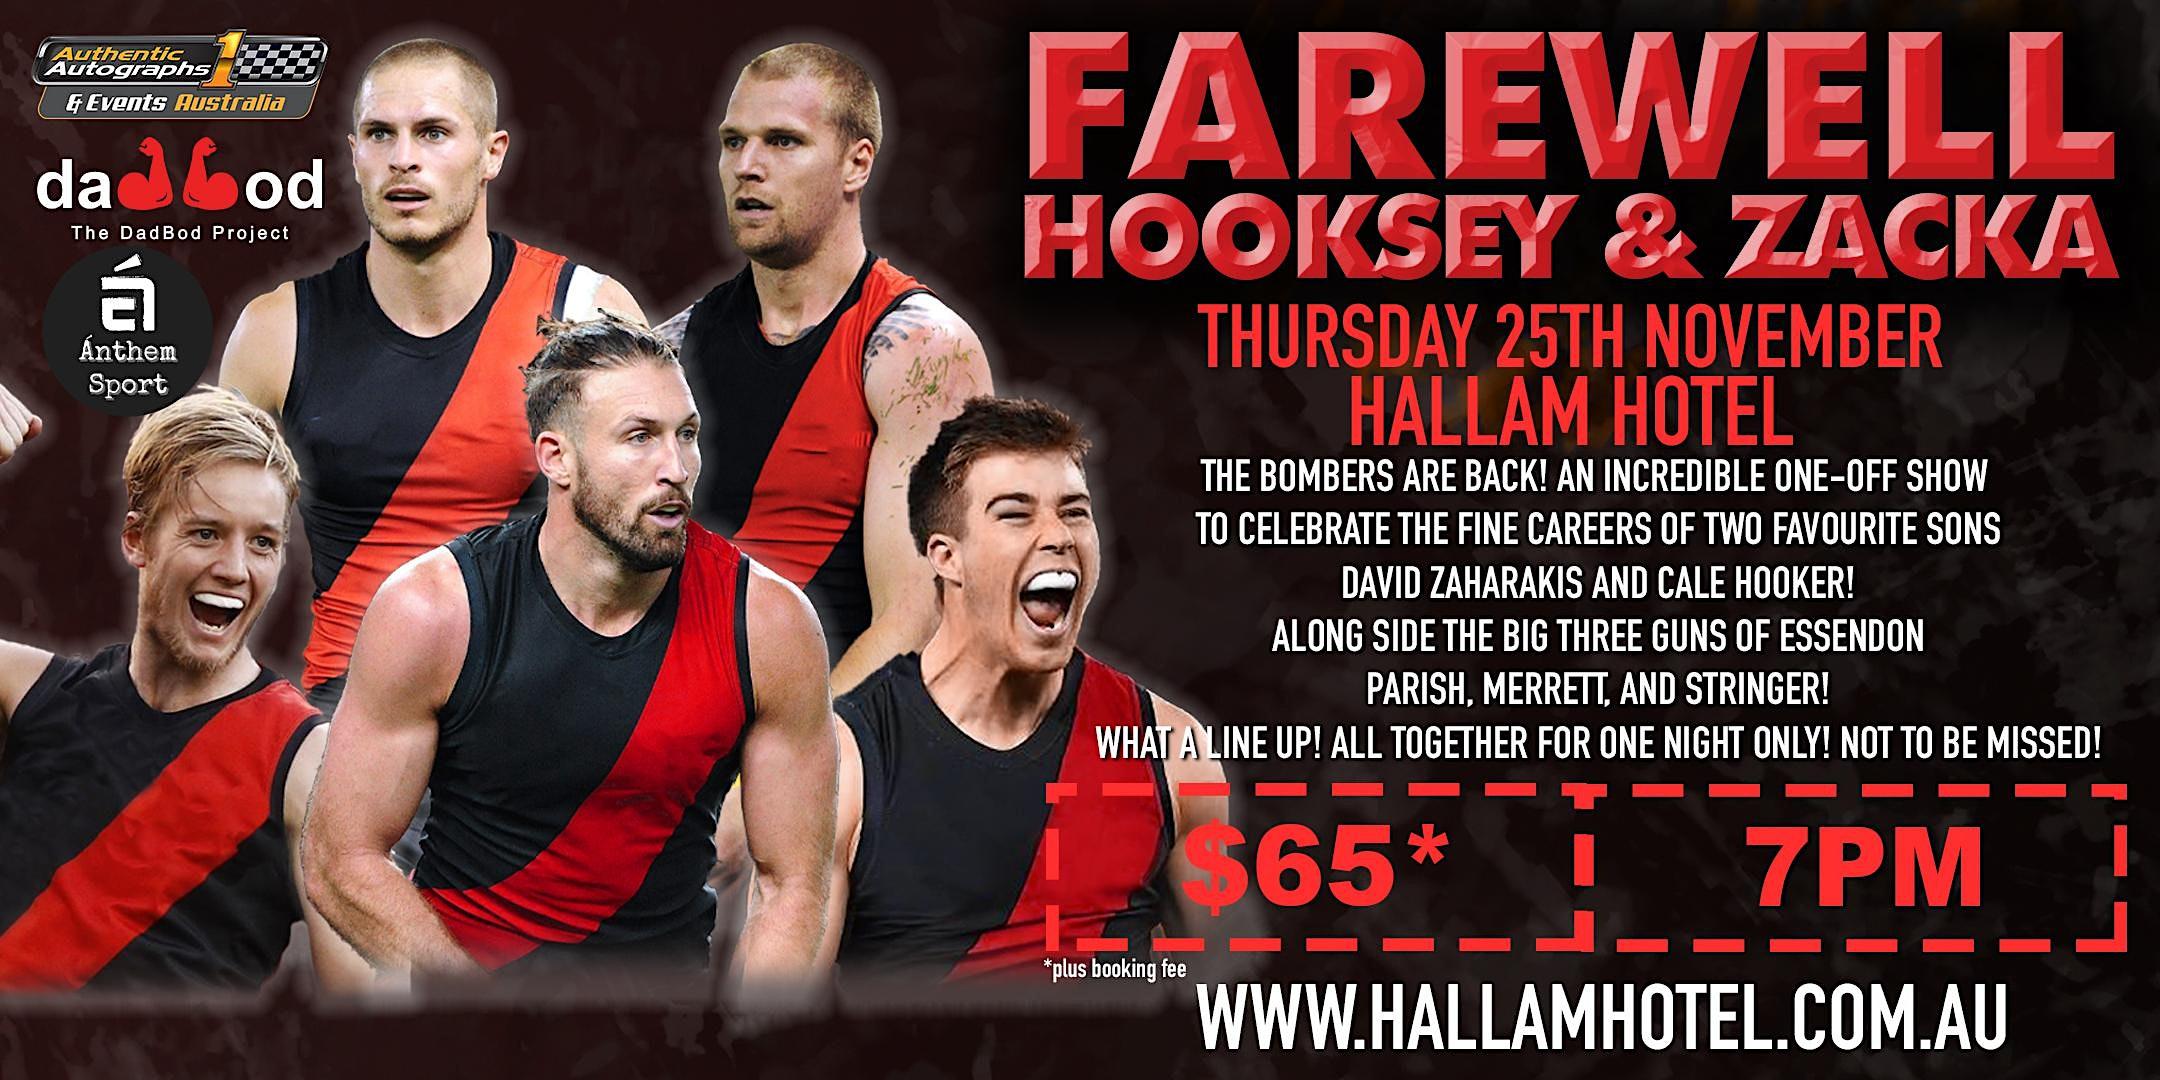 Farewell 2 bombers greats – David Zaharakis and Cale Hooker @Hallam Hotel!